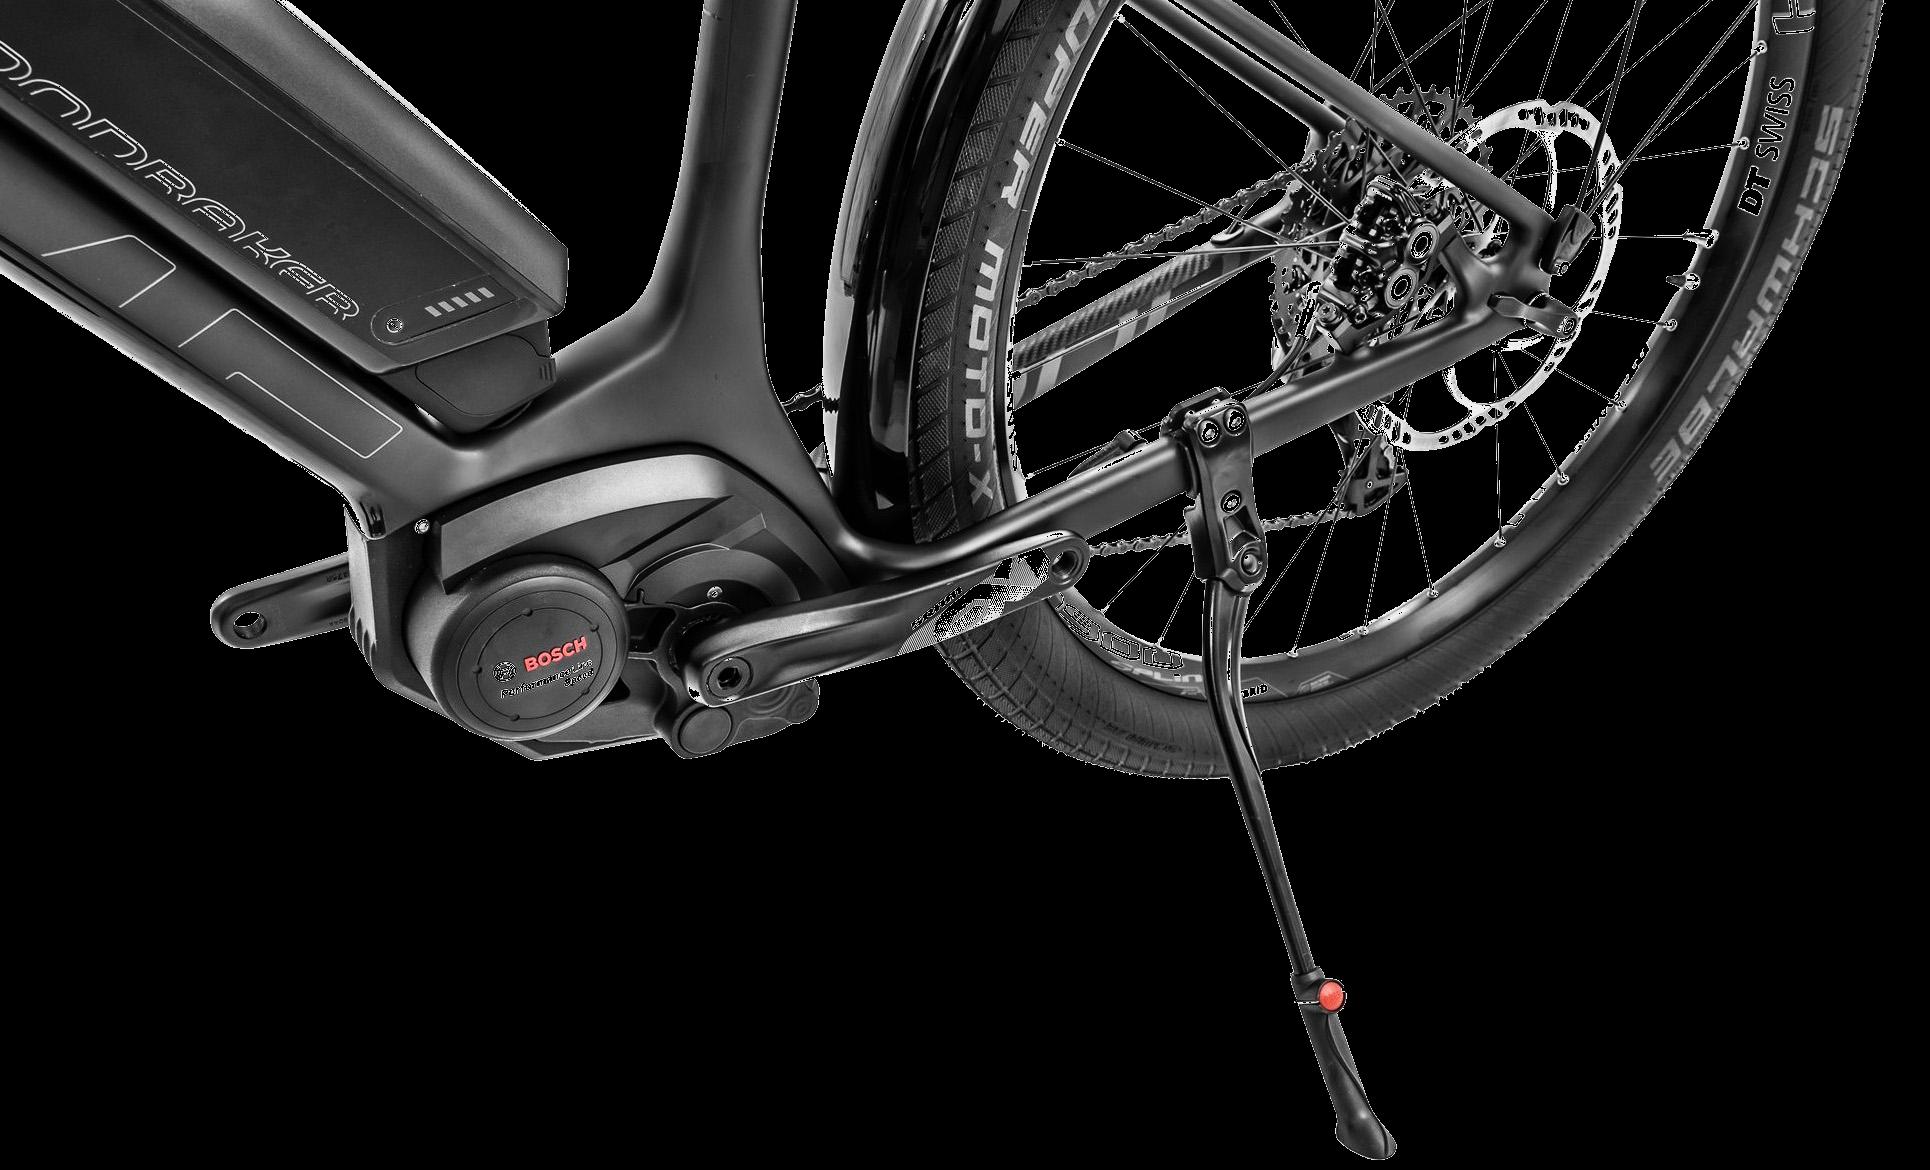 https://w8w5m3f8.stackpathcdn.com/17183/vtt-electrique-speedbike-prime-carbon-noir-sx-45kmh-500wh-275.jpg